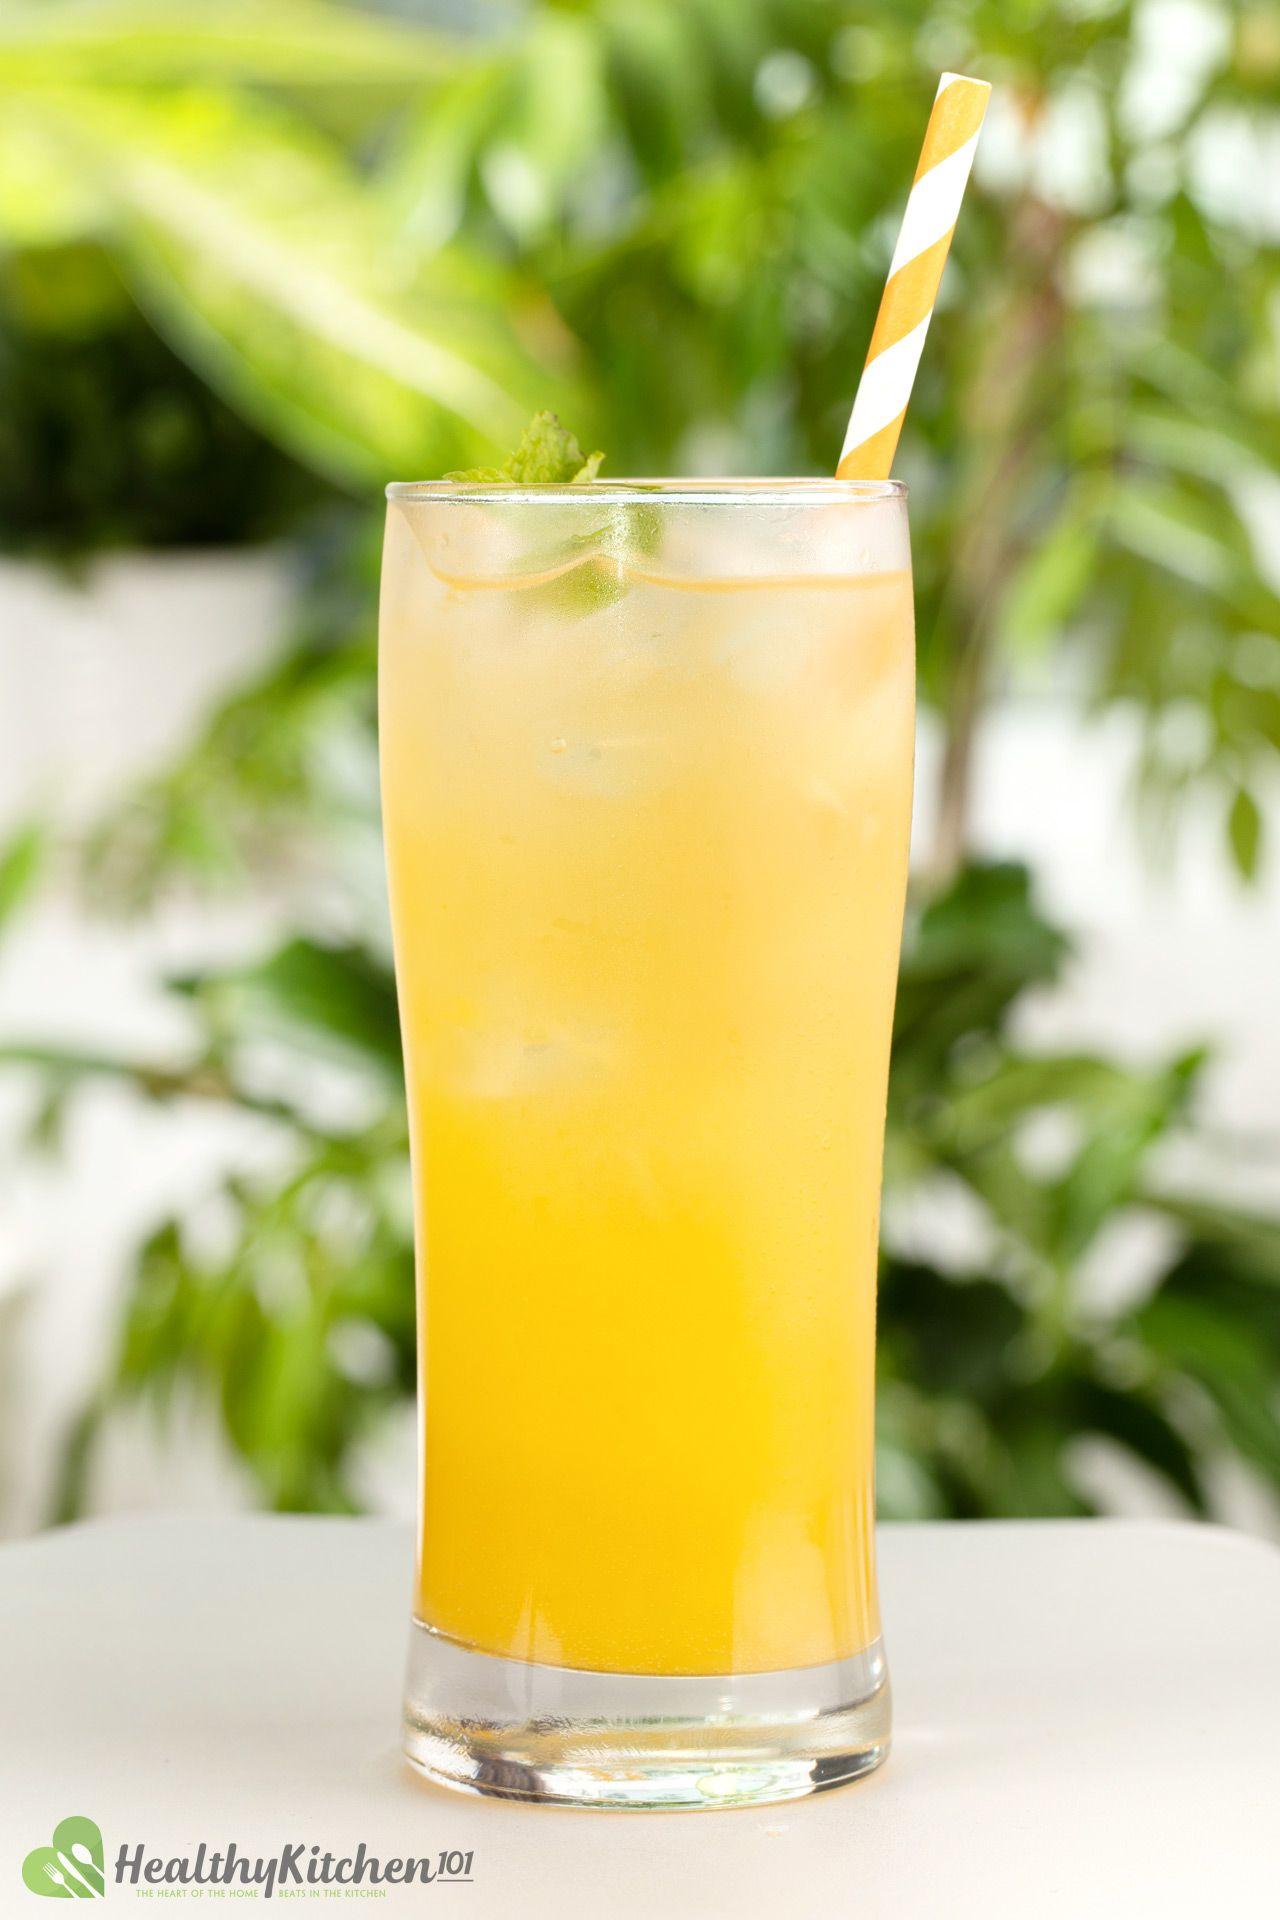 Homemade Ginger Ale and Orange Juice Recipe